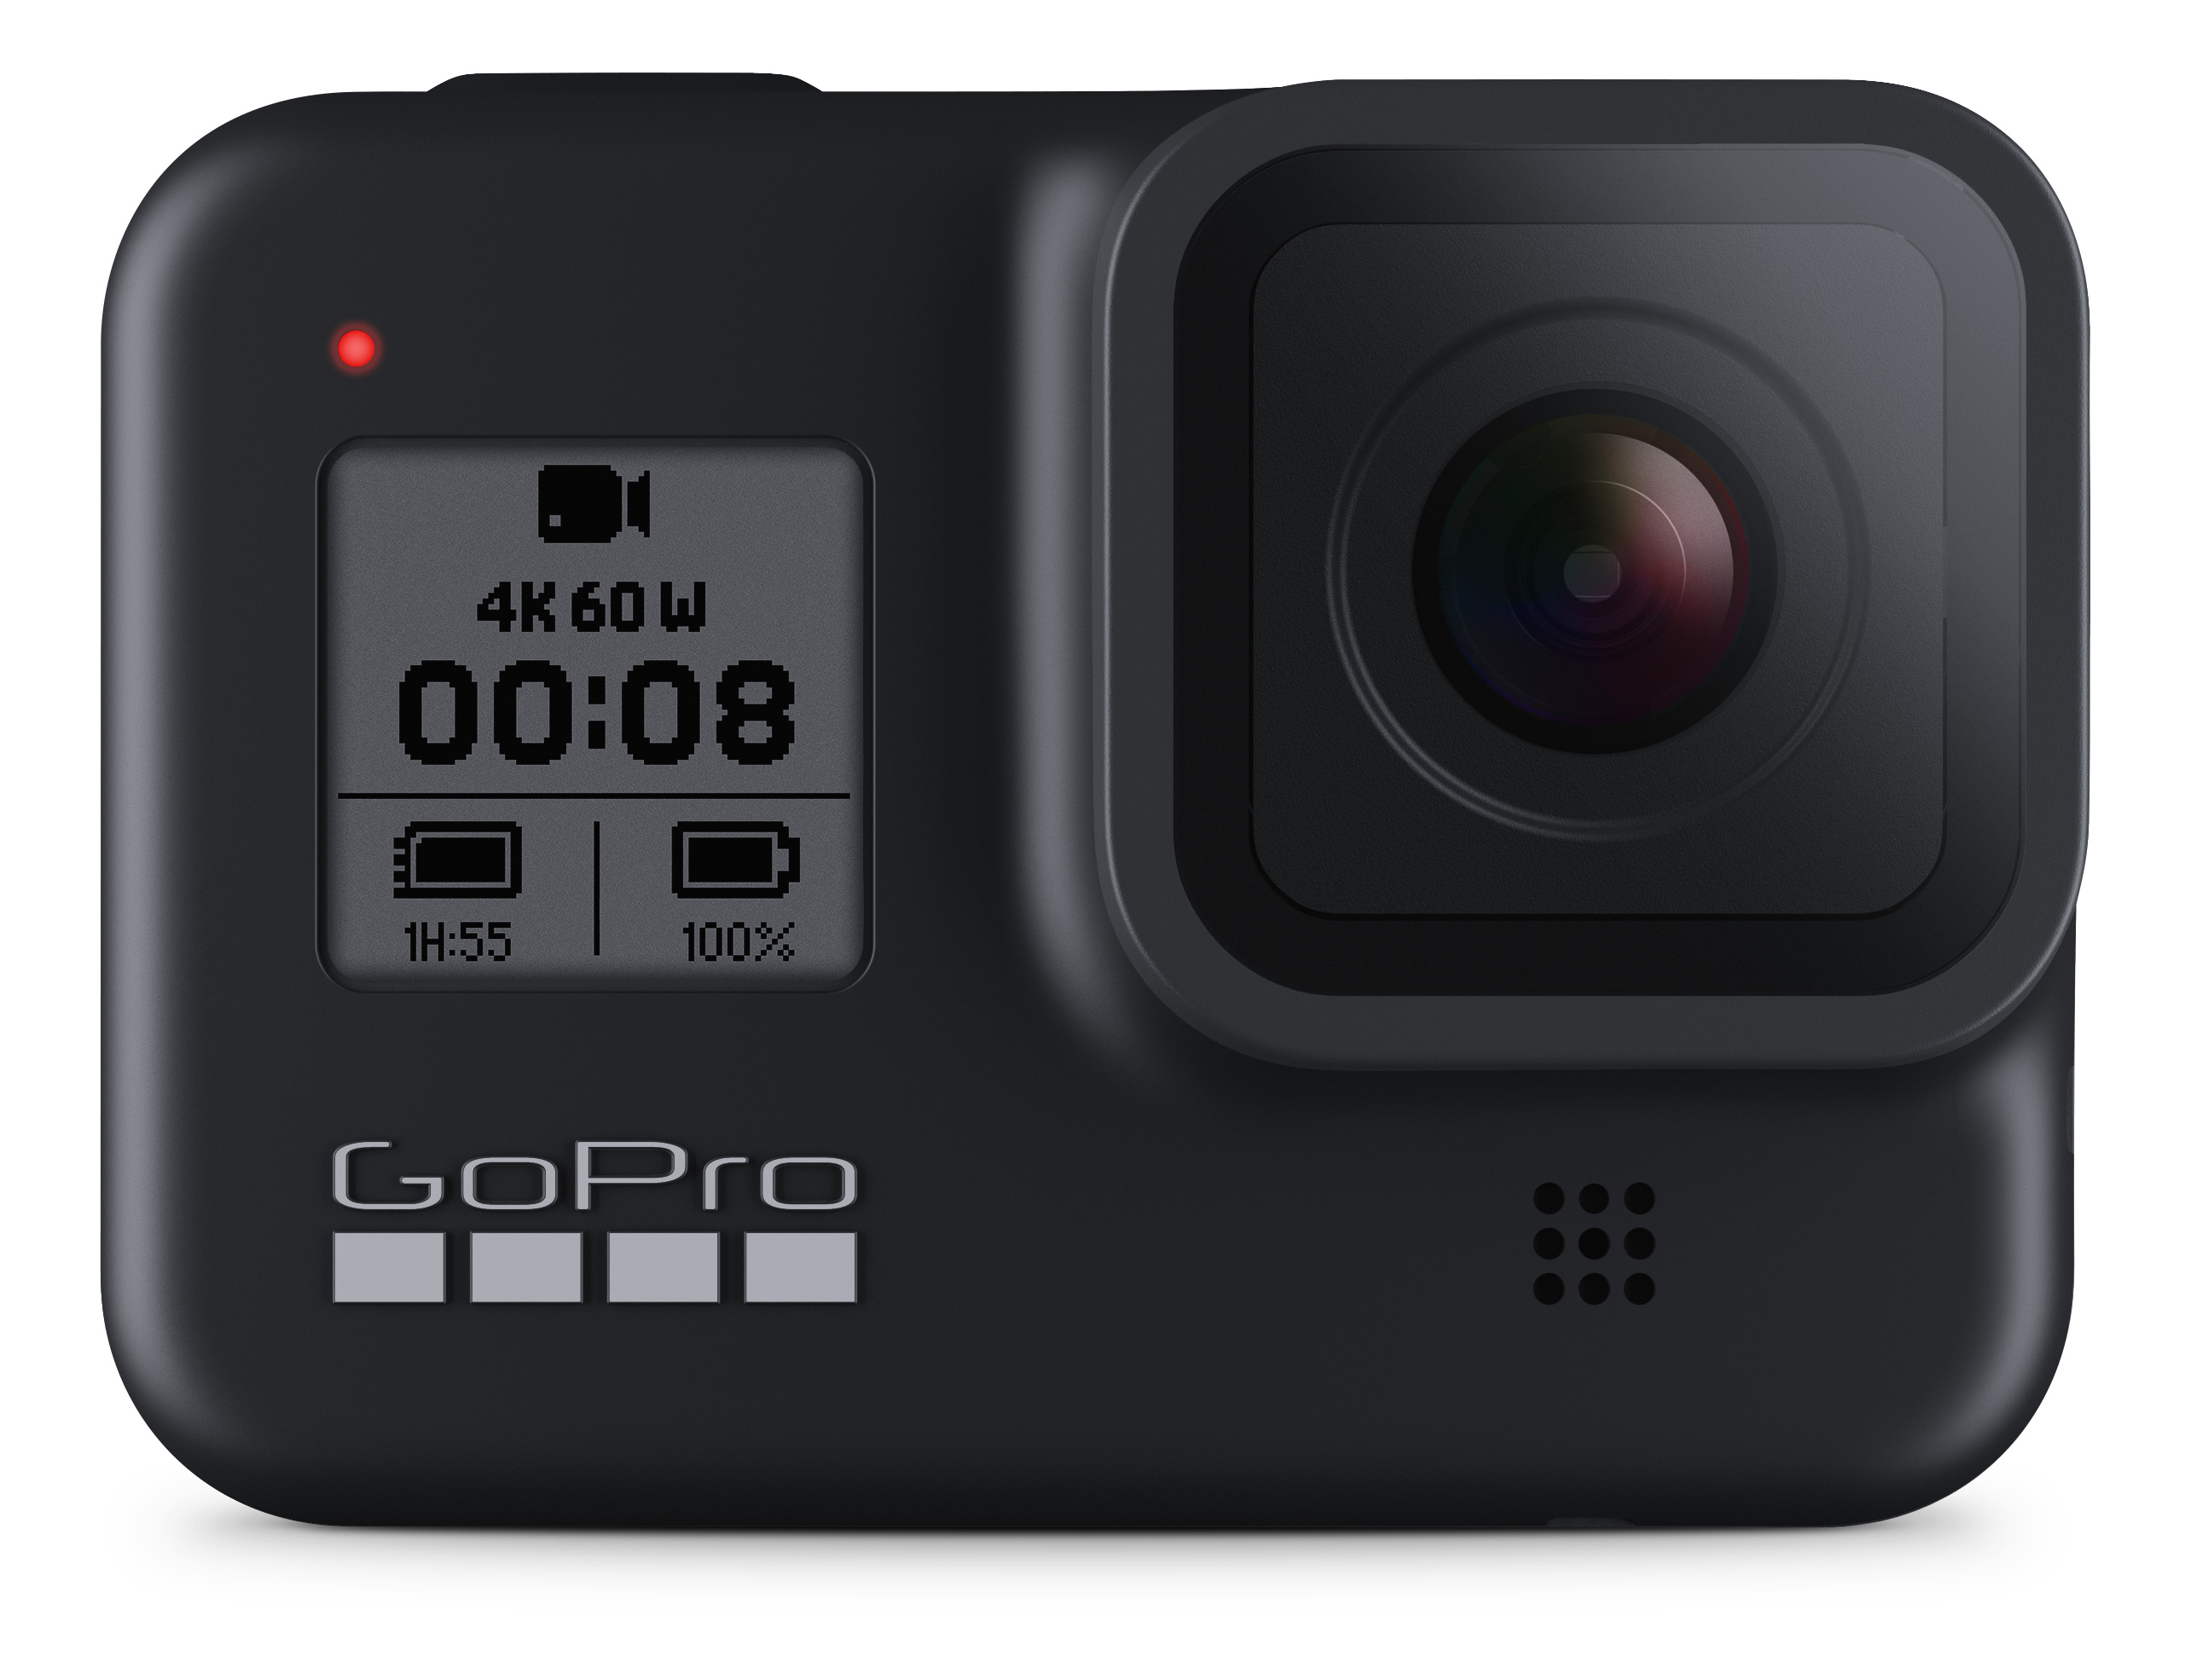 GoPro HERO8 Black Camera - Apple (AE)